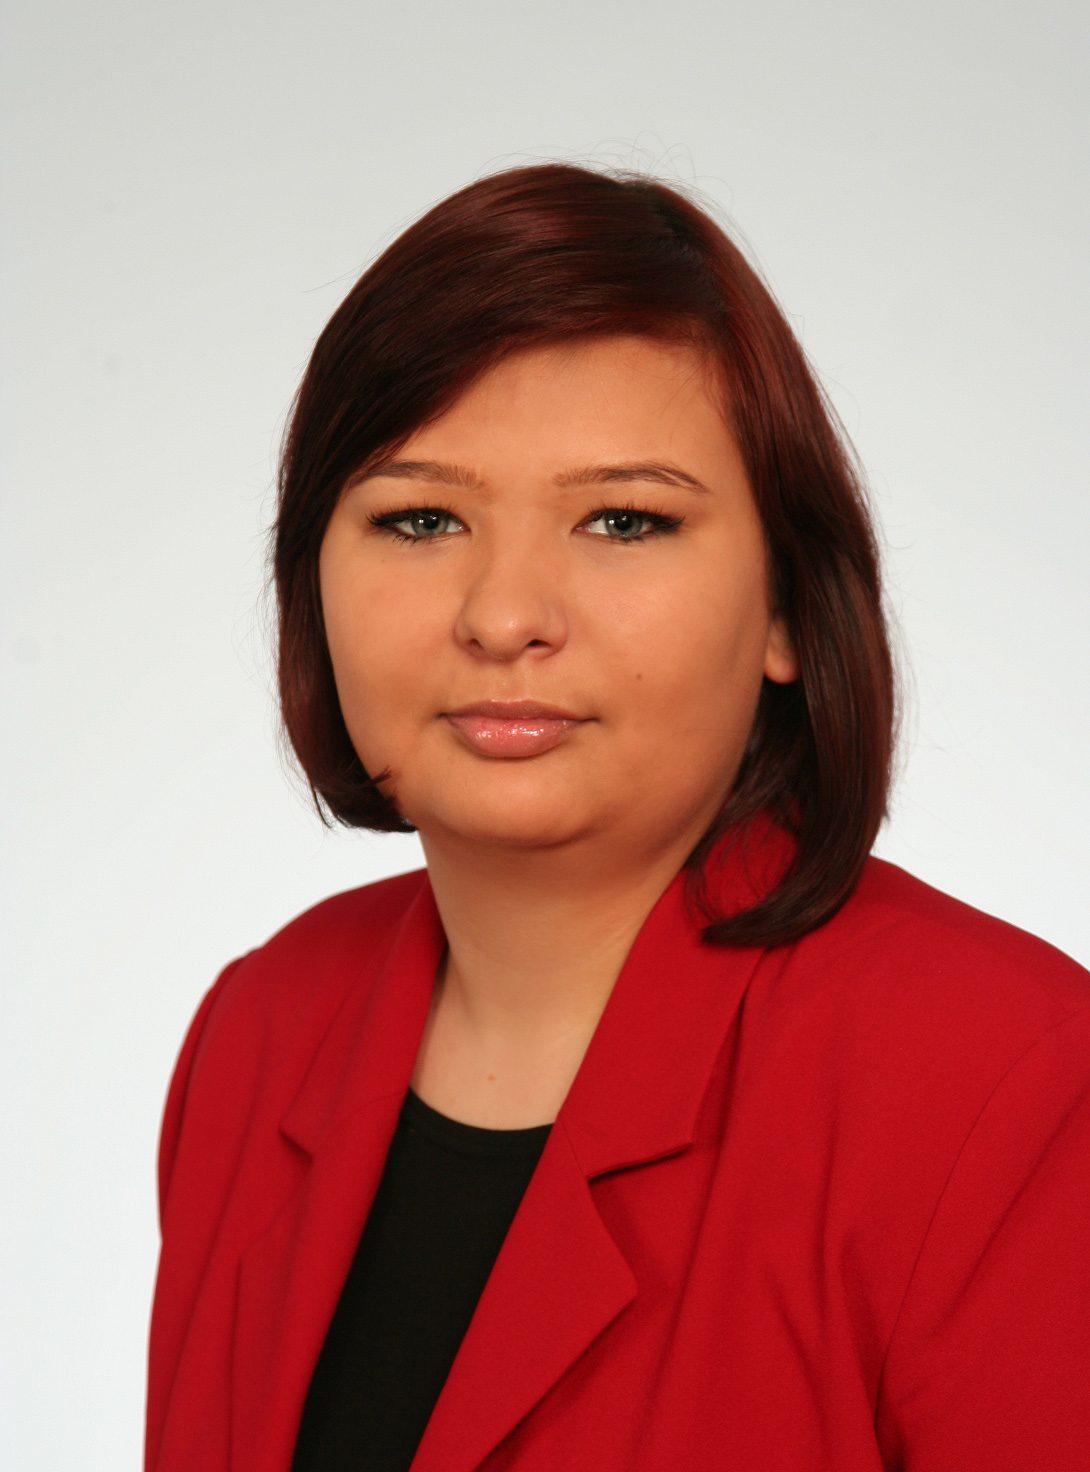 Marta Bąk